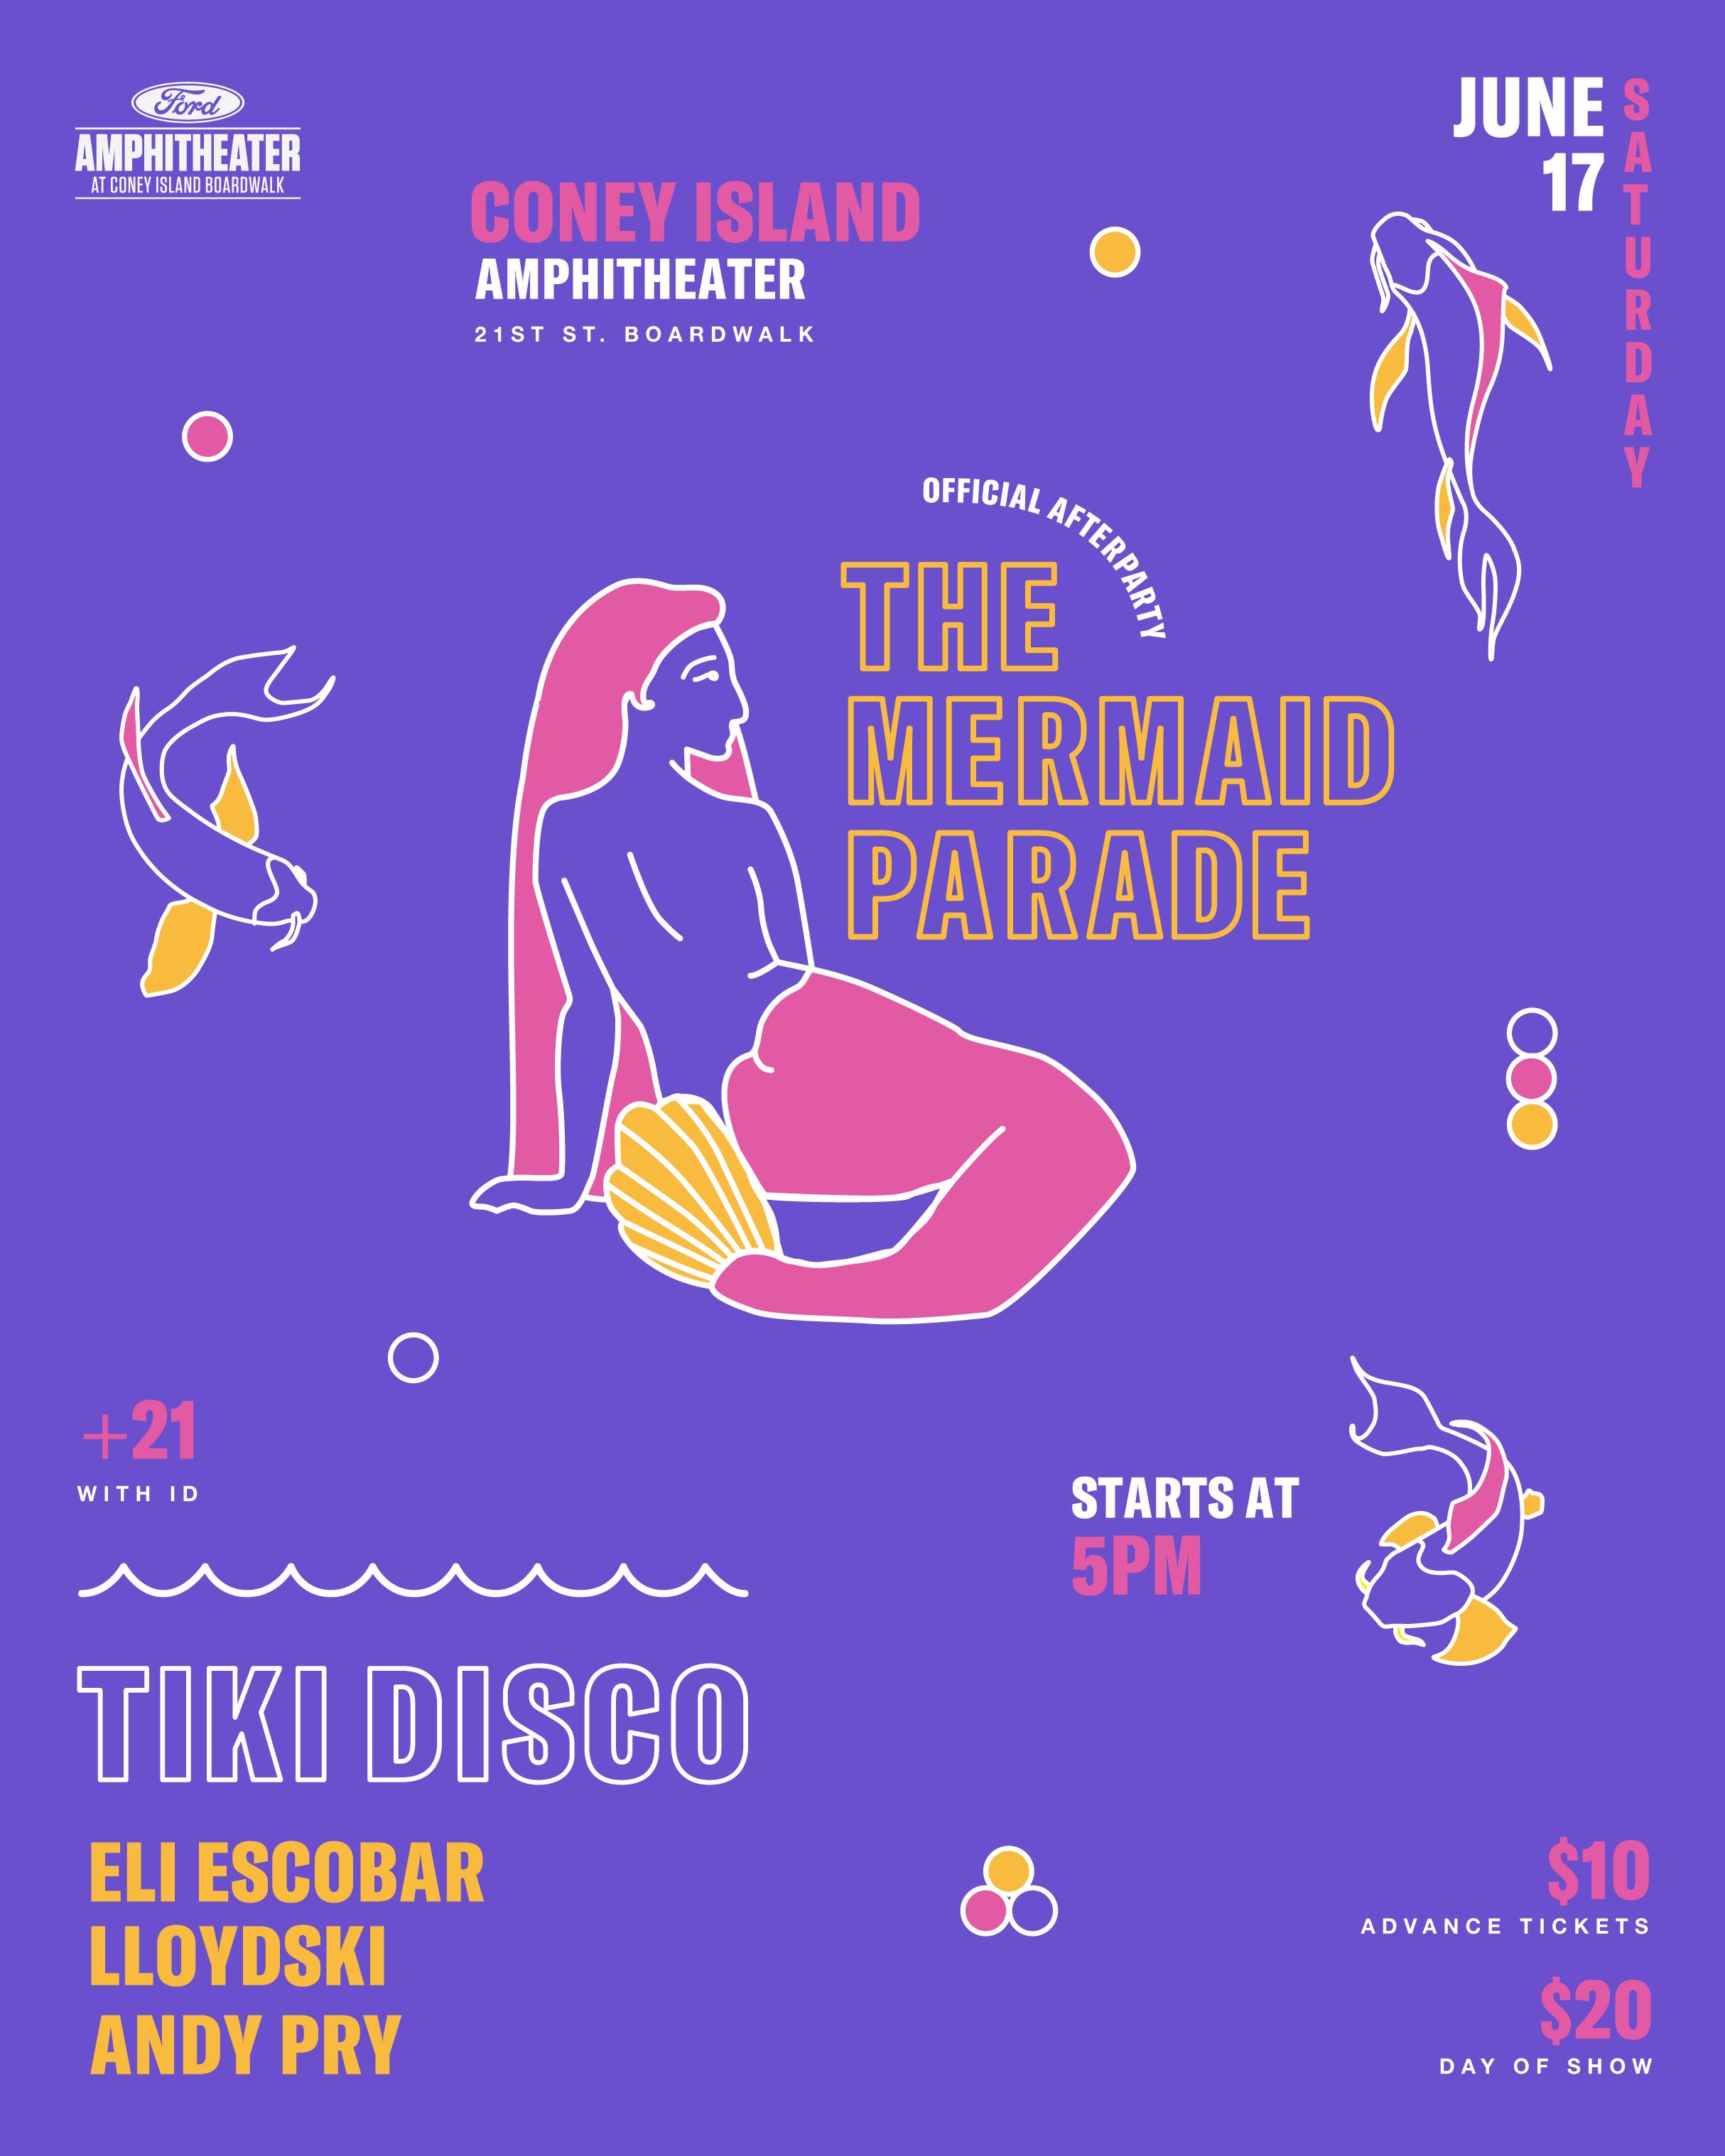 2017-04-29_tikidisco_mermaidfest_02.png